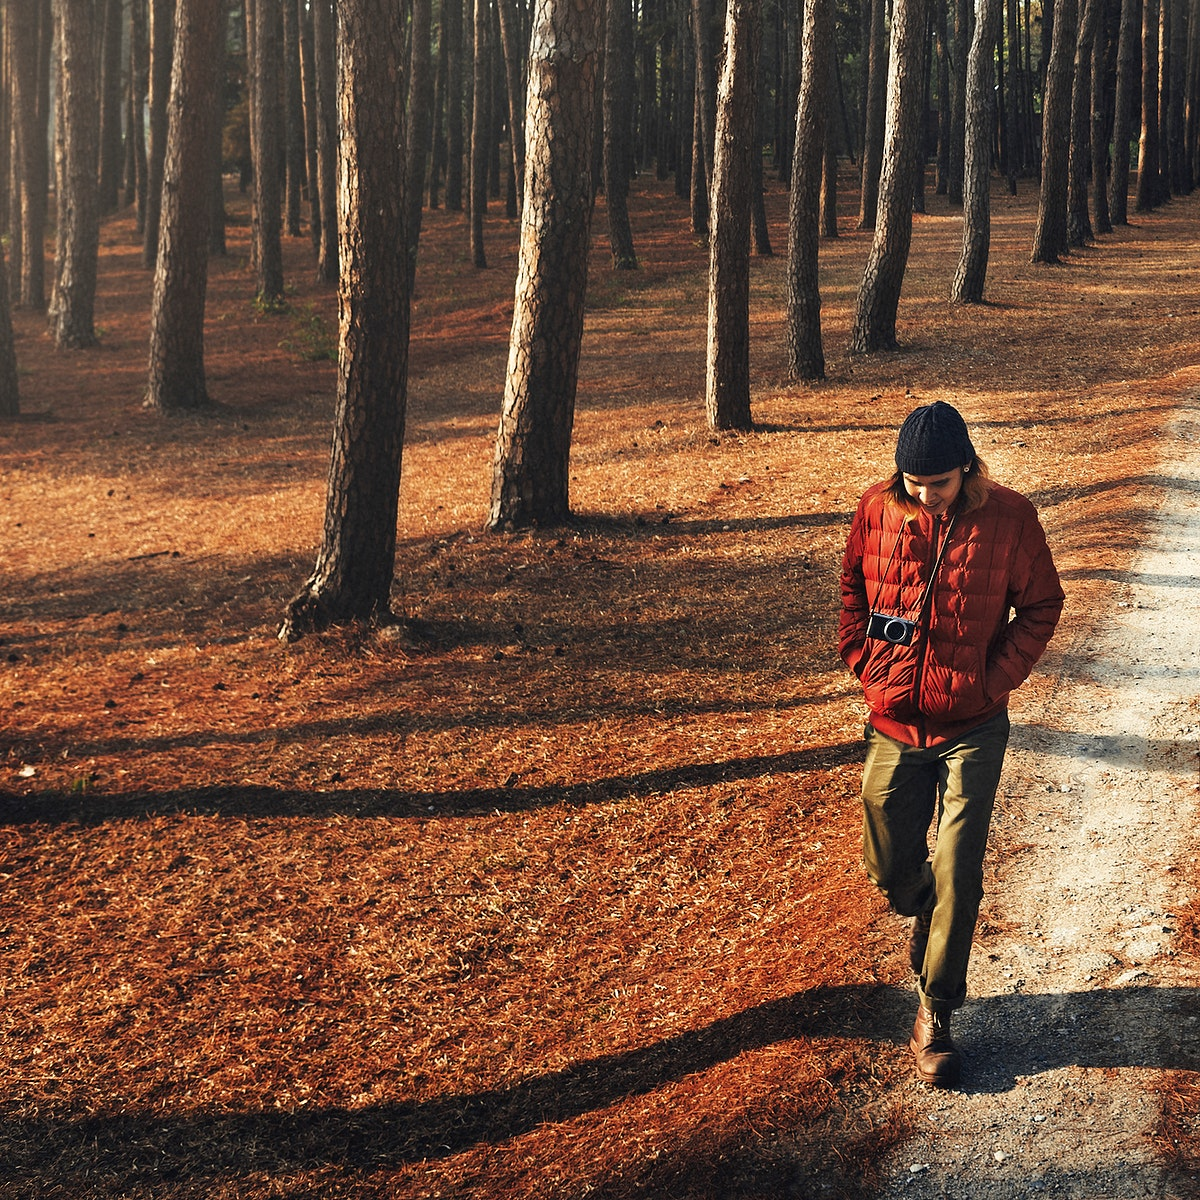 Asian man walking trekking in the wood